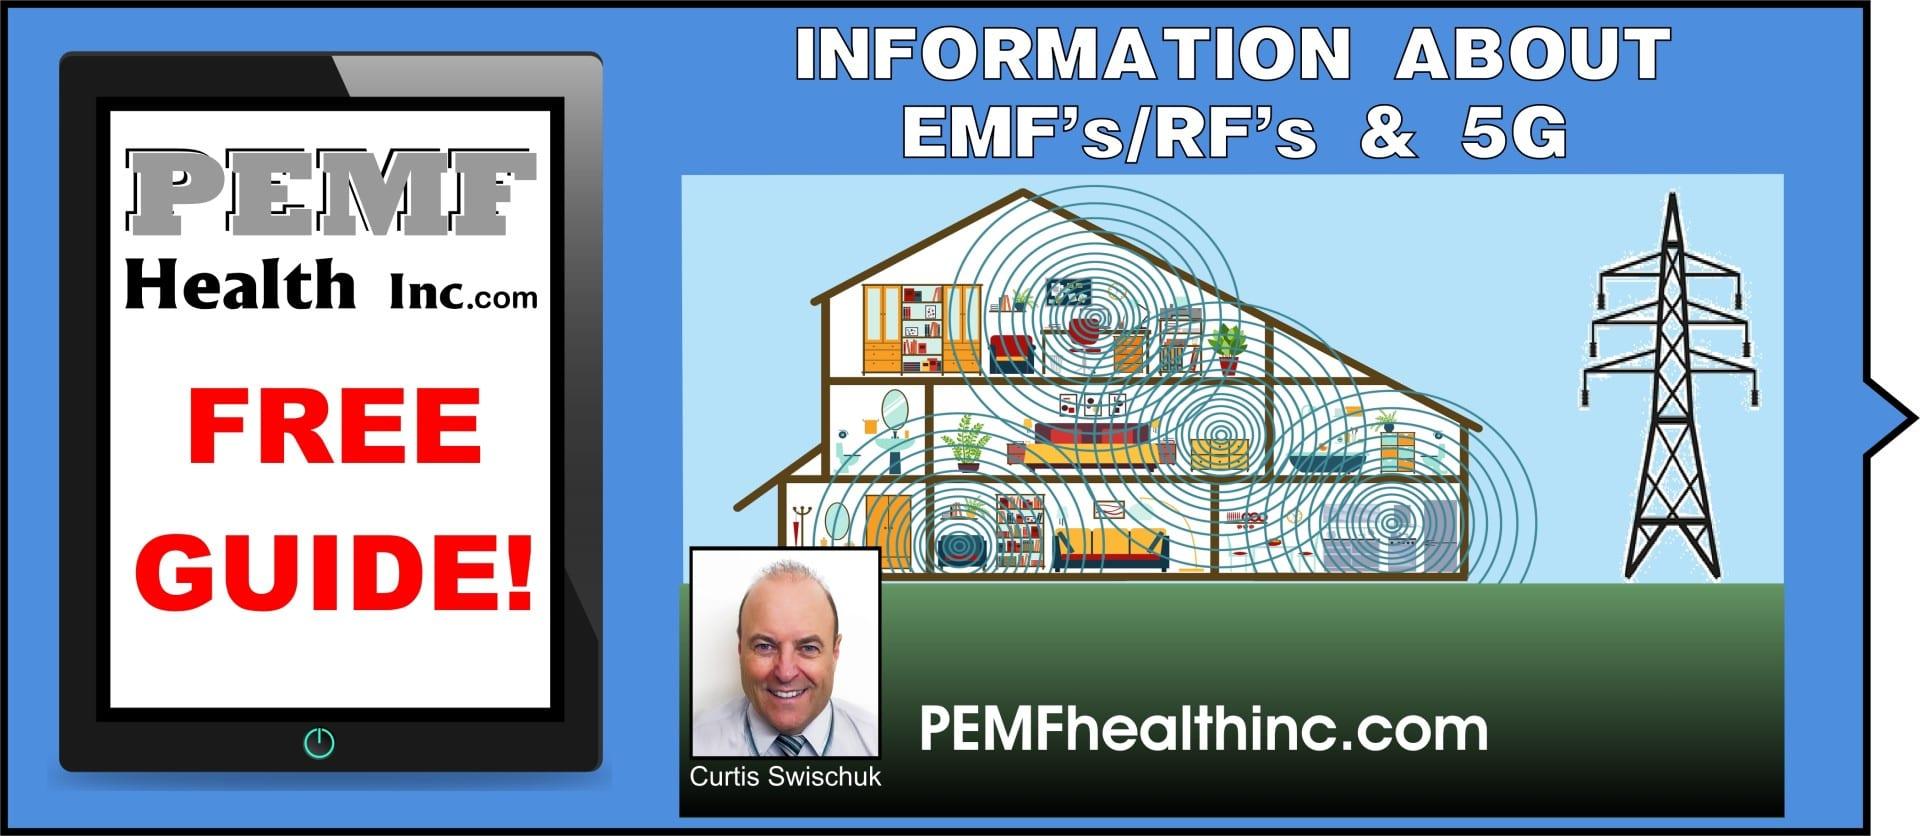 FREE Guide- EMF's/ RF's & 5G- PEMF Health Inc.